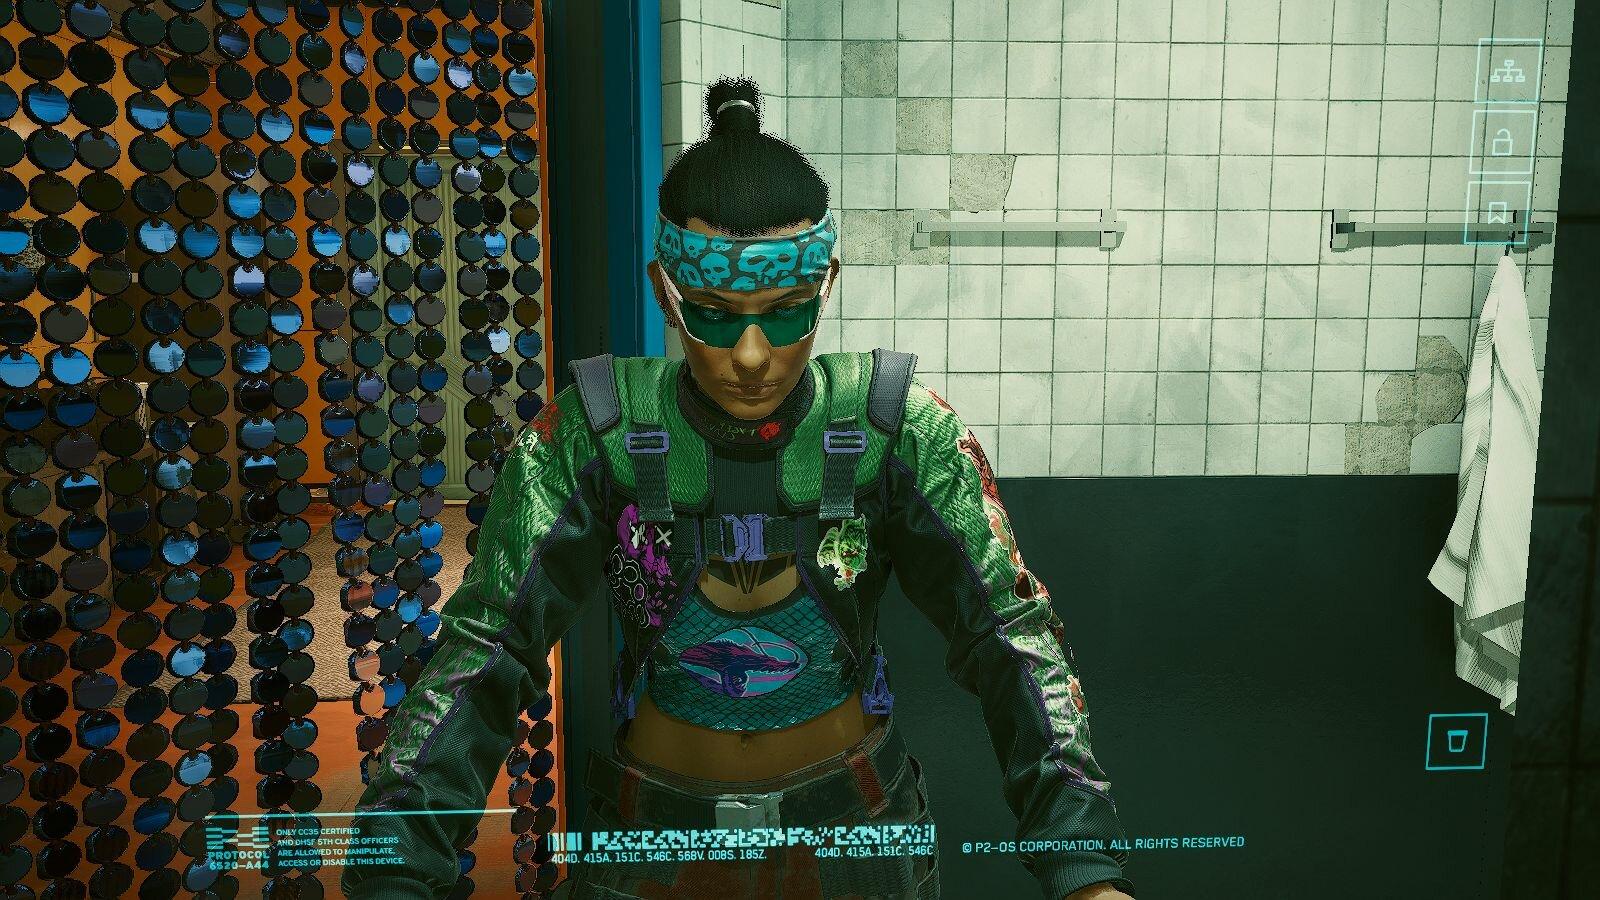 У зеркала в кафе.. Cyberpunk 2077